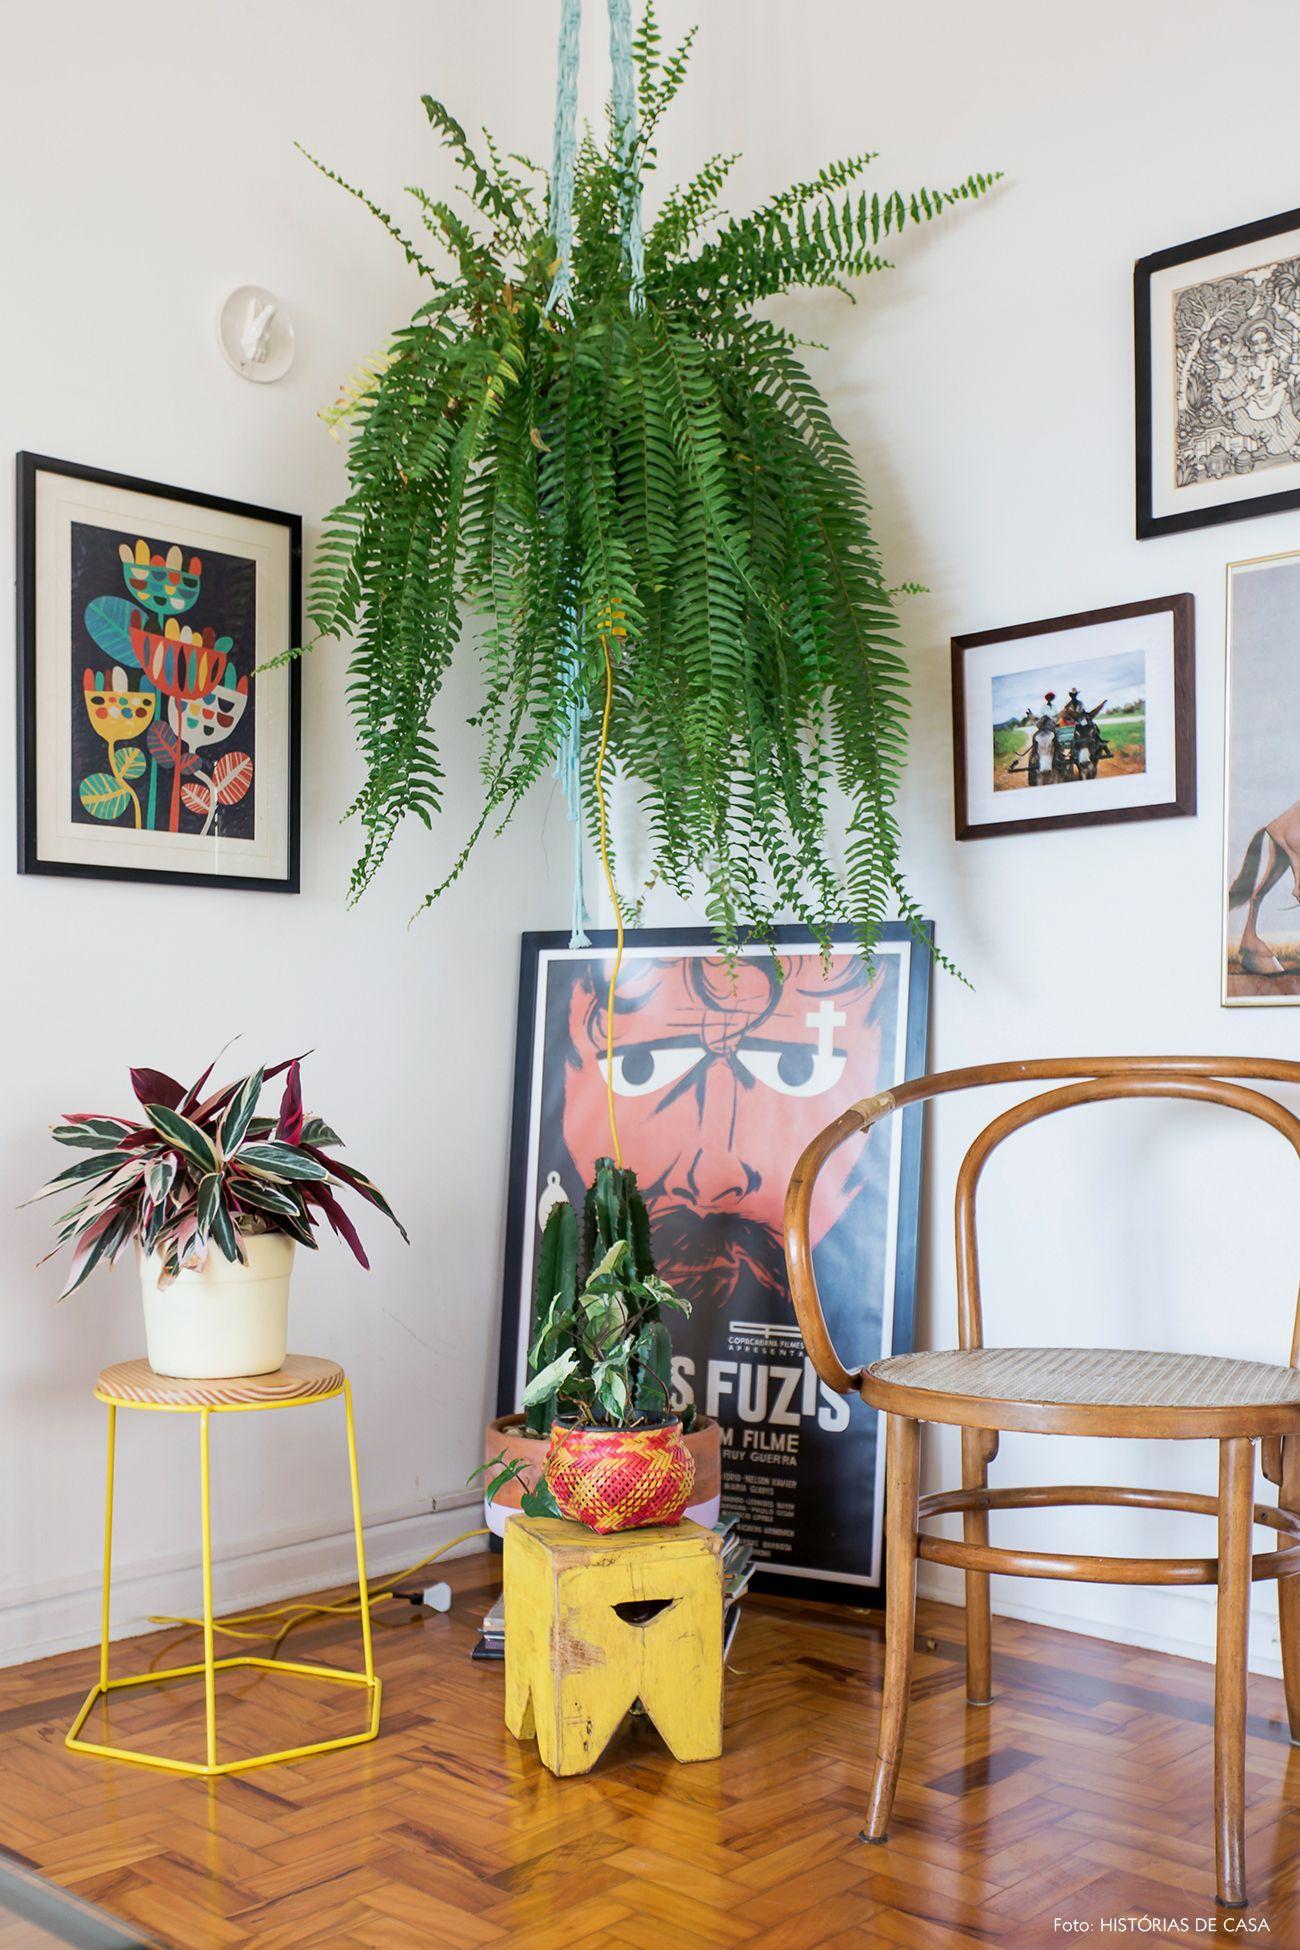 #unicorn nail #nail 2019 tendencia #decor chambre #disney nail #diy gegen langeweile #garden plans #garden aesthetic #diy geschenke